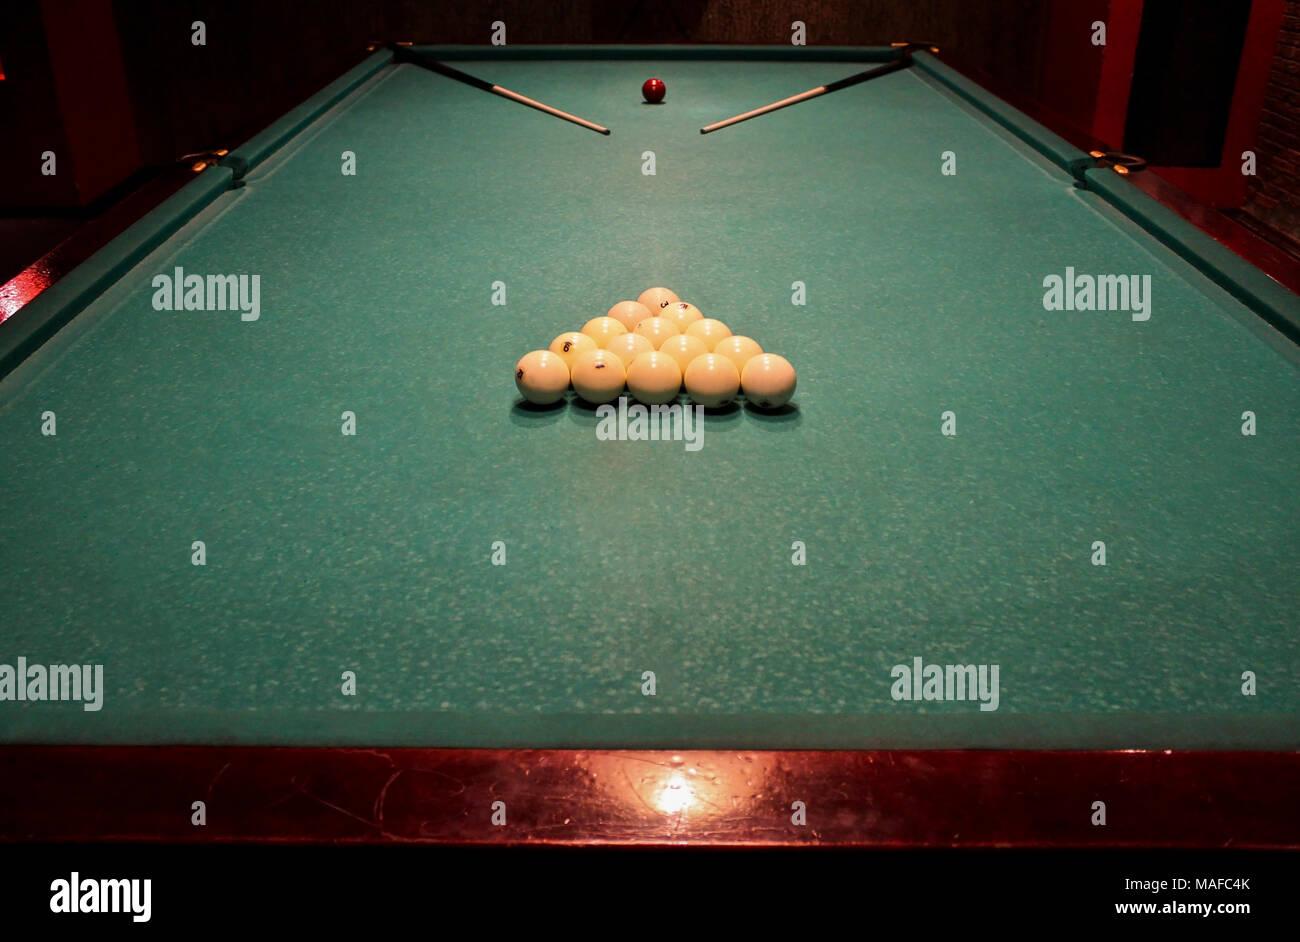 russian billiards rules